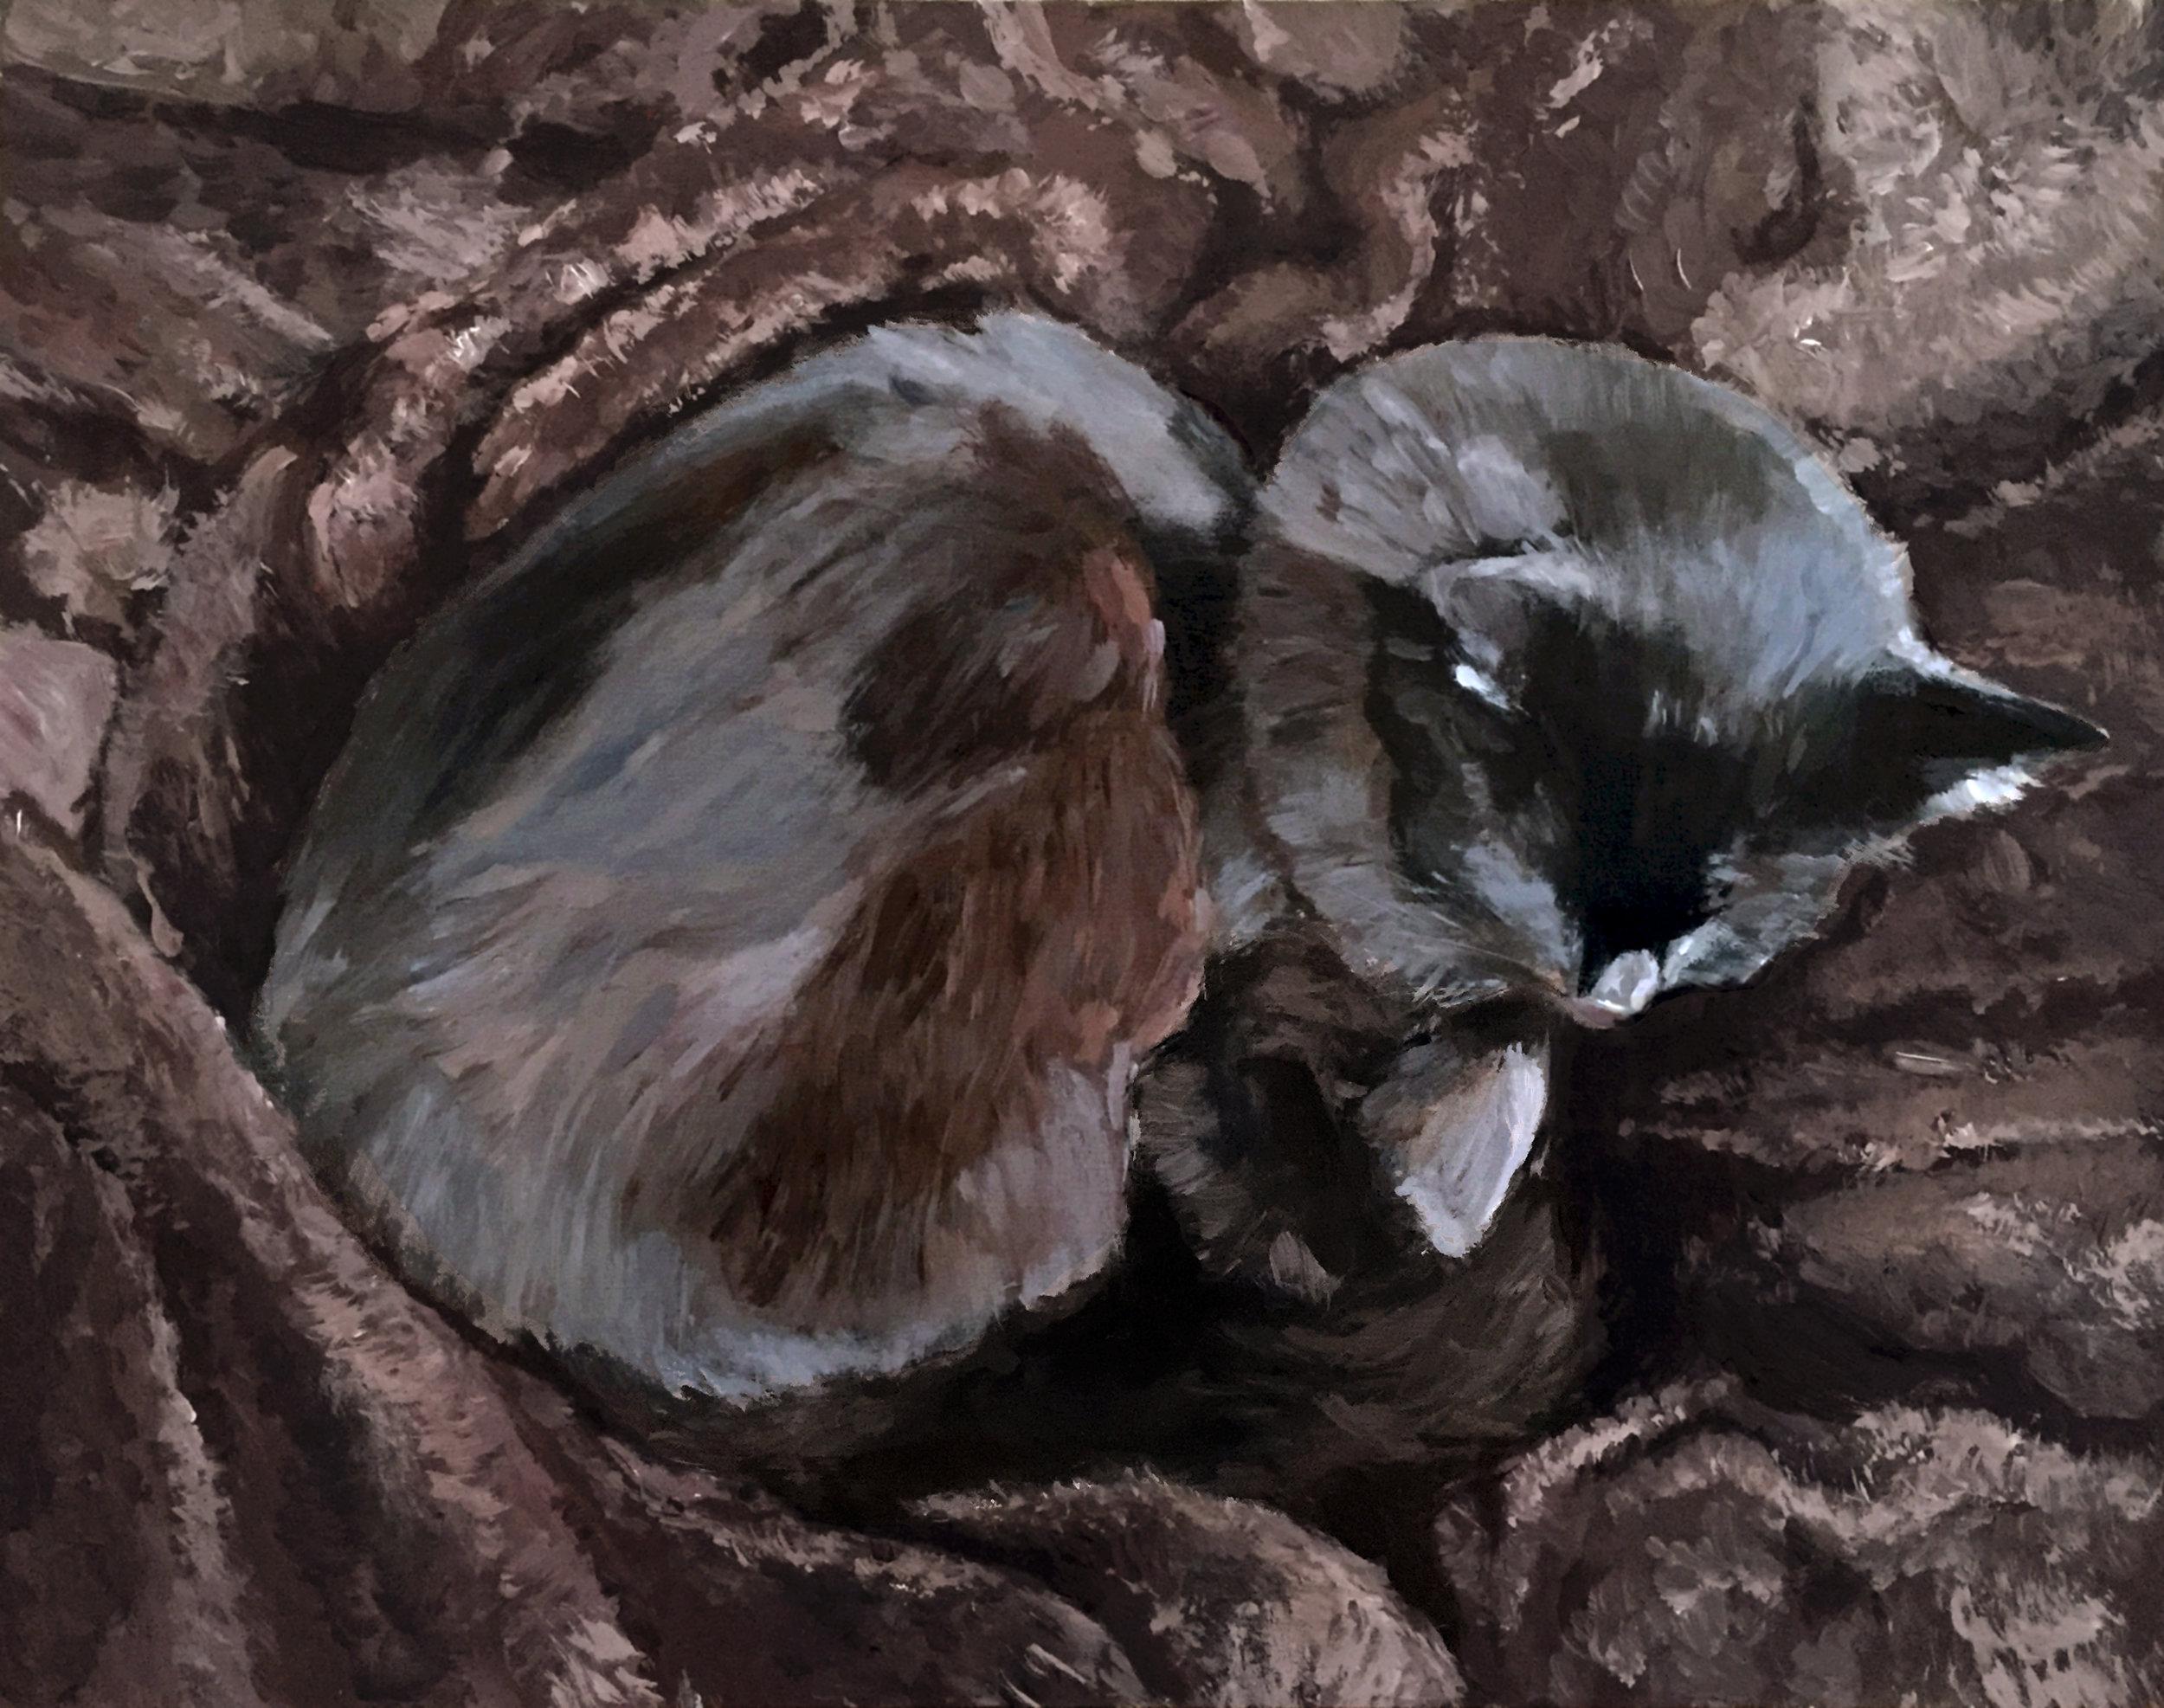 Black cat on a fuzzy blanket